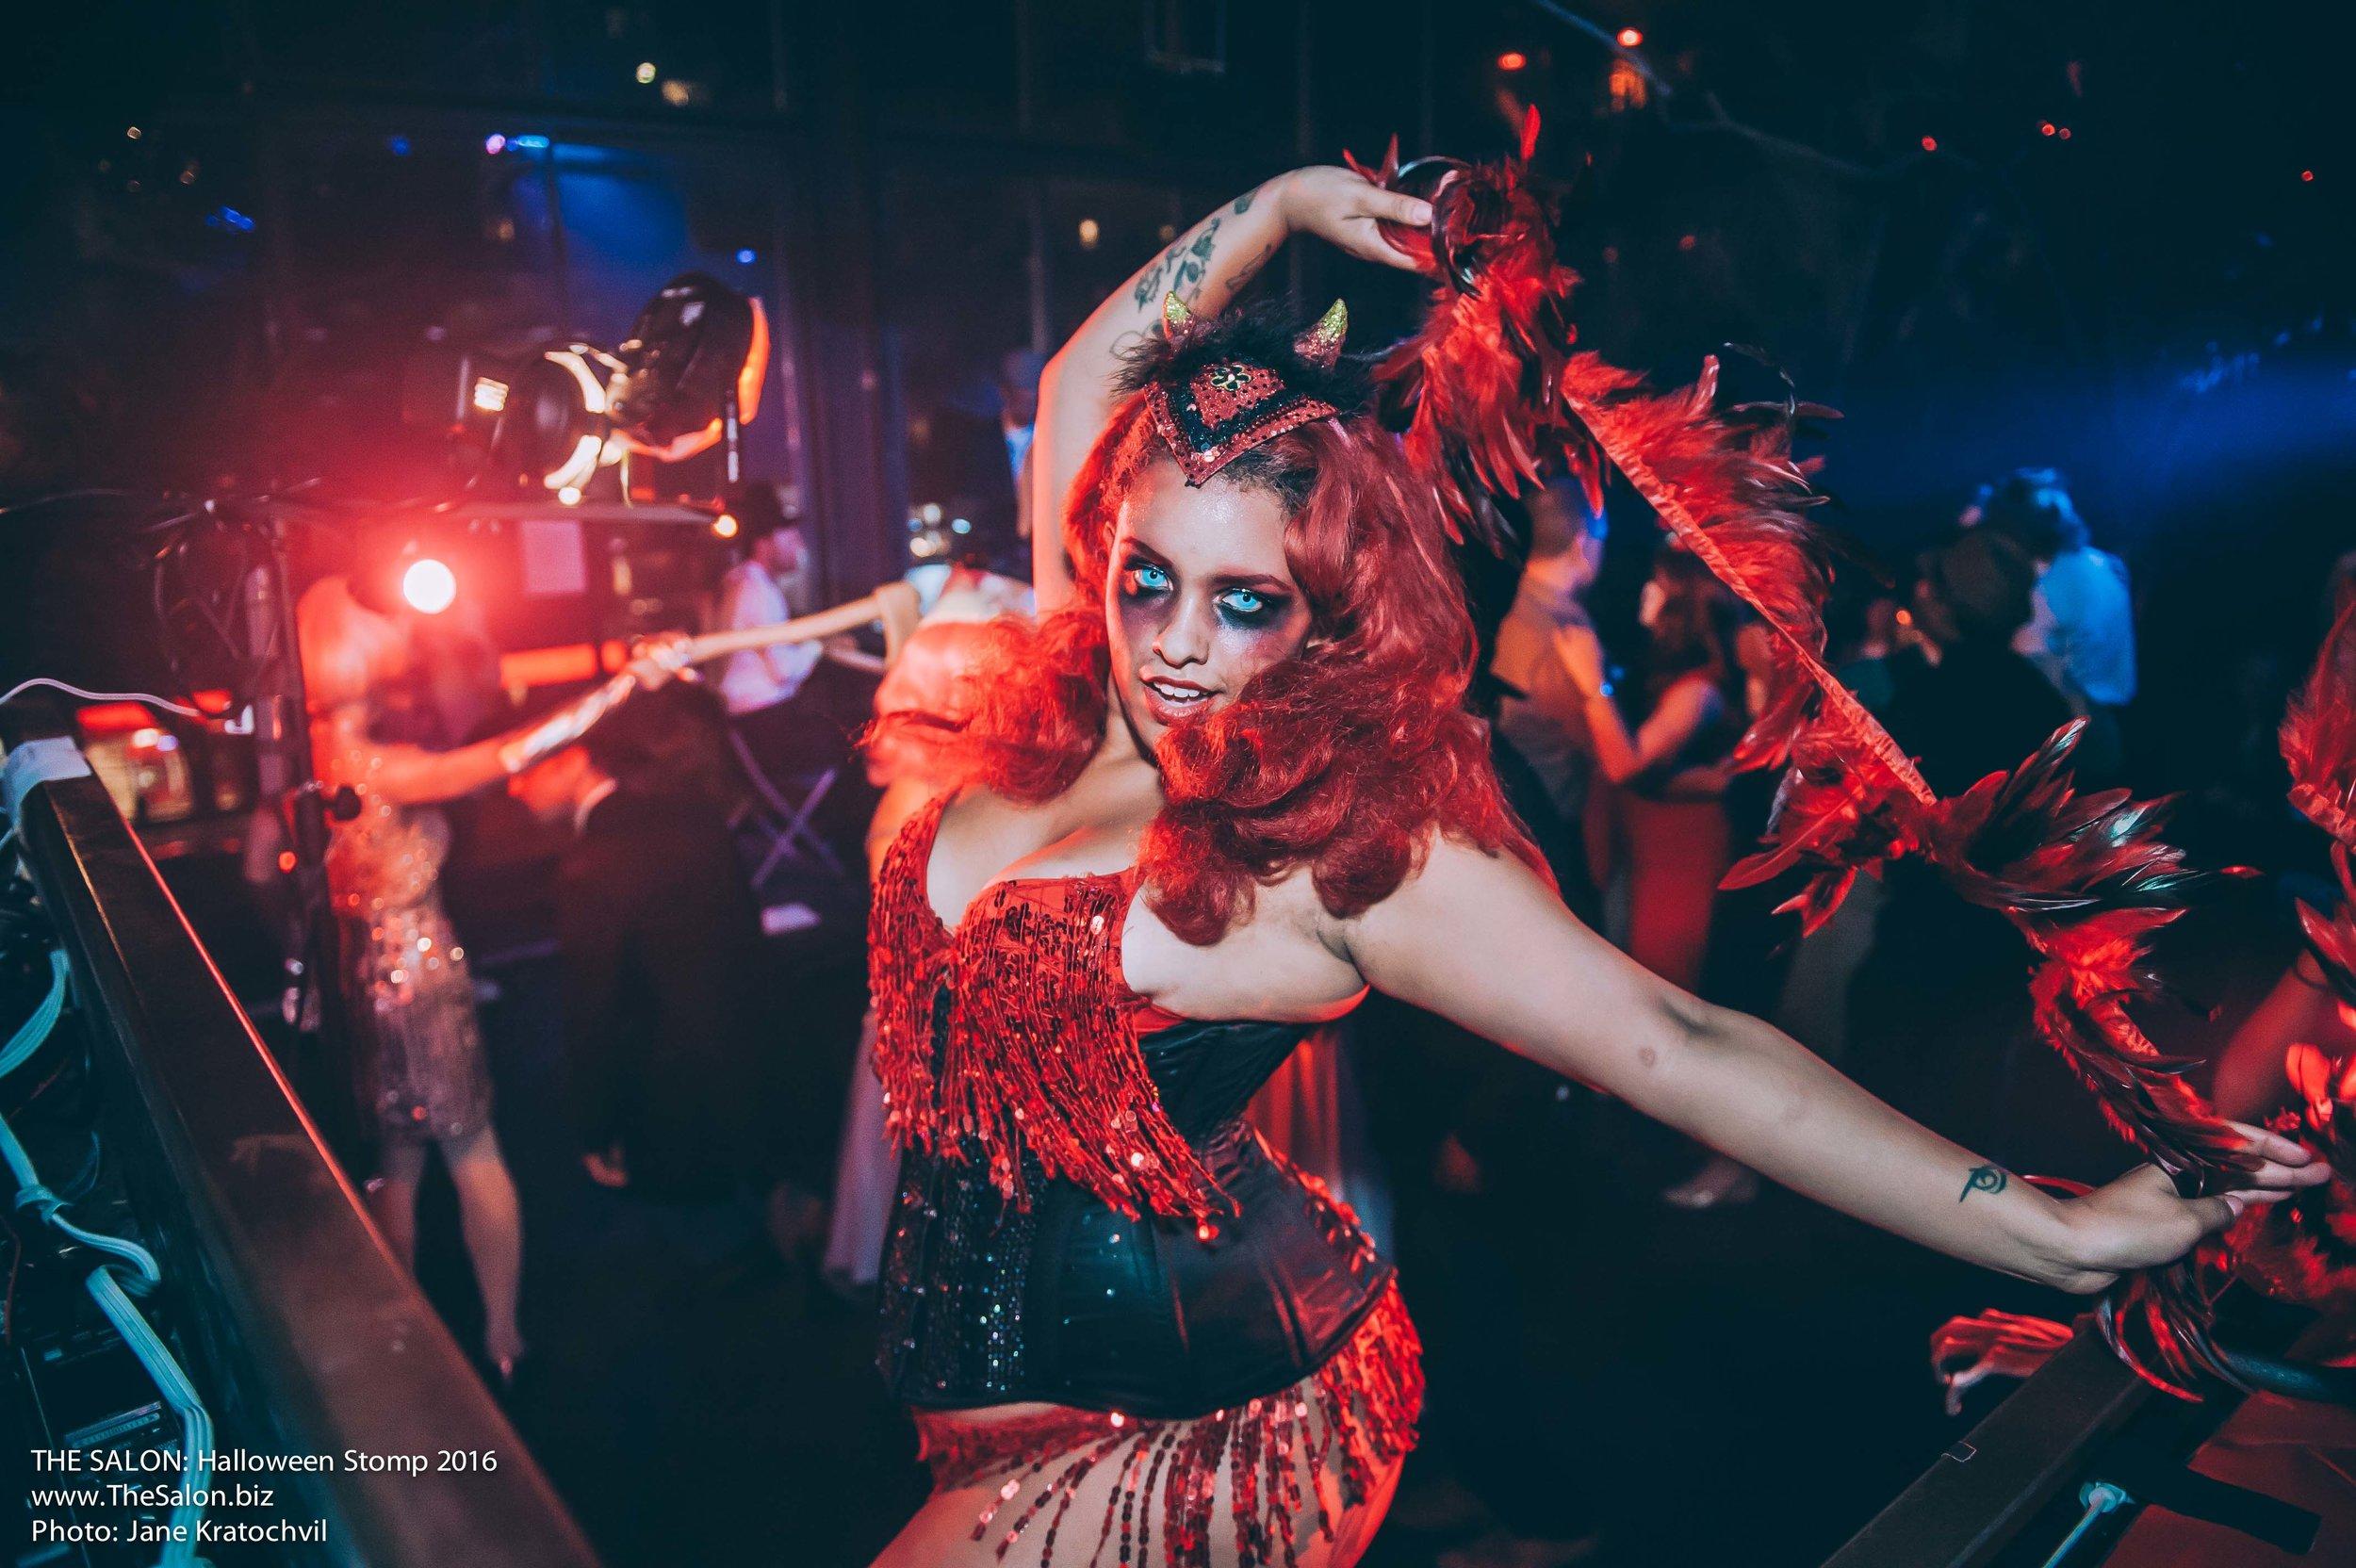 THE-SALON_HalloweenStomp16__photocredit-jane-kratochvil__0054.jpg